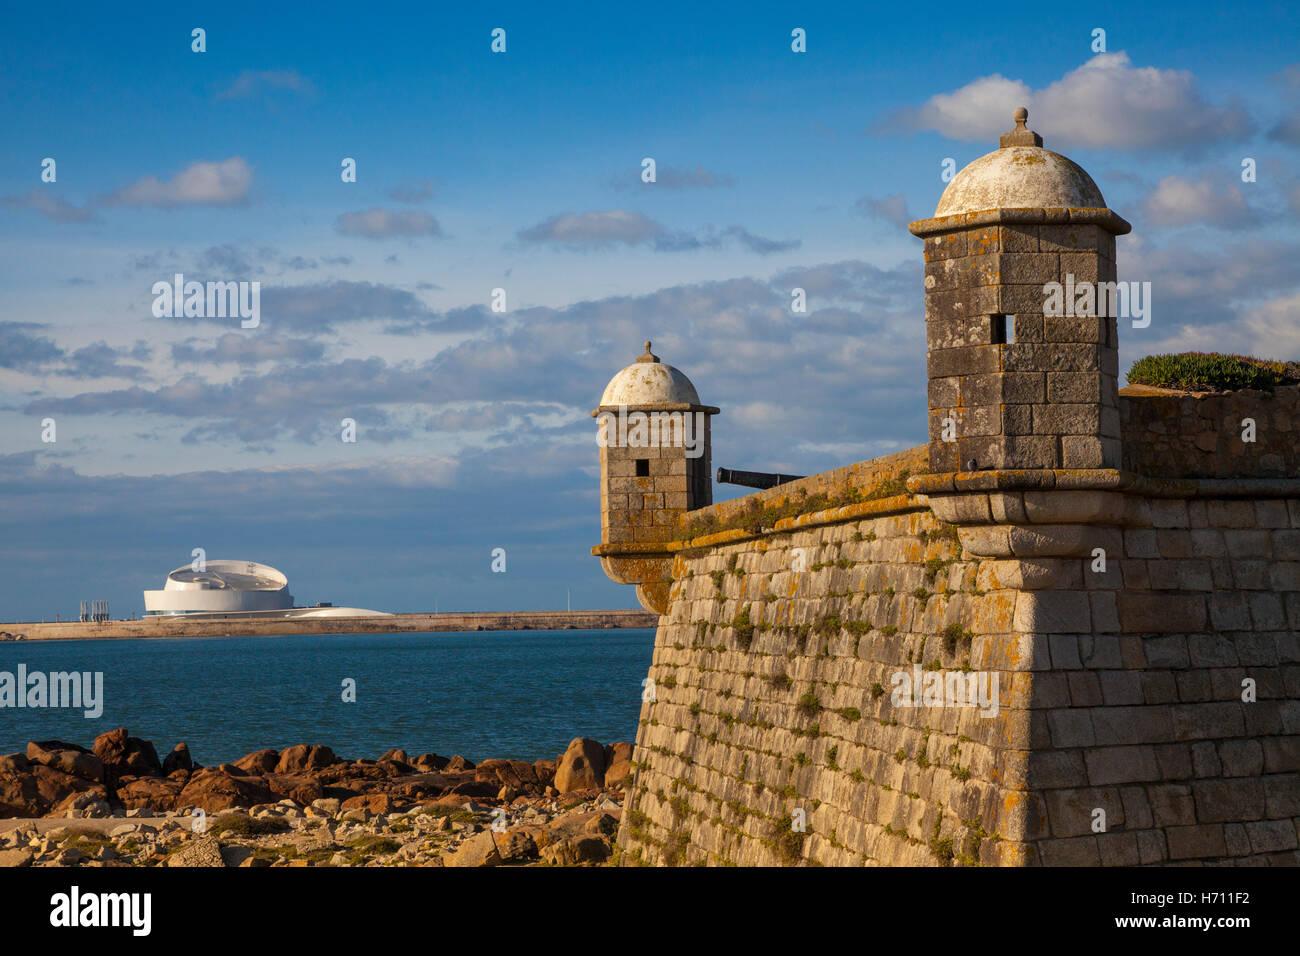 The Forte de Sao Francisco Xavier fort from 1832, Porto, UNESCO site, Portugal, Europe Stock Photo